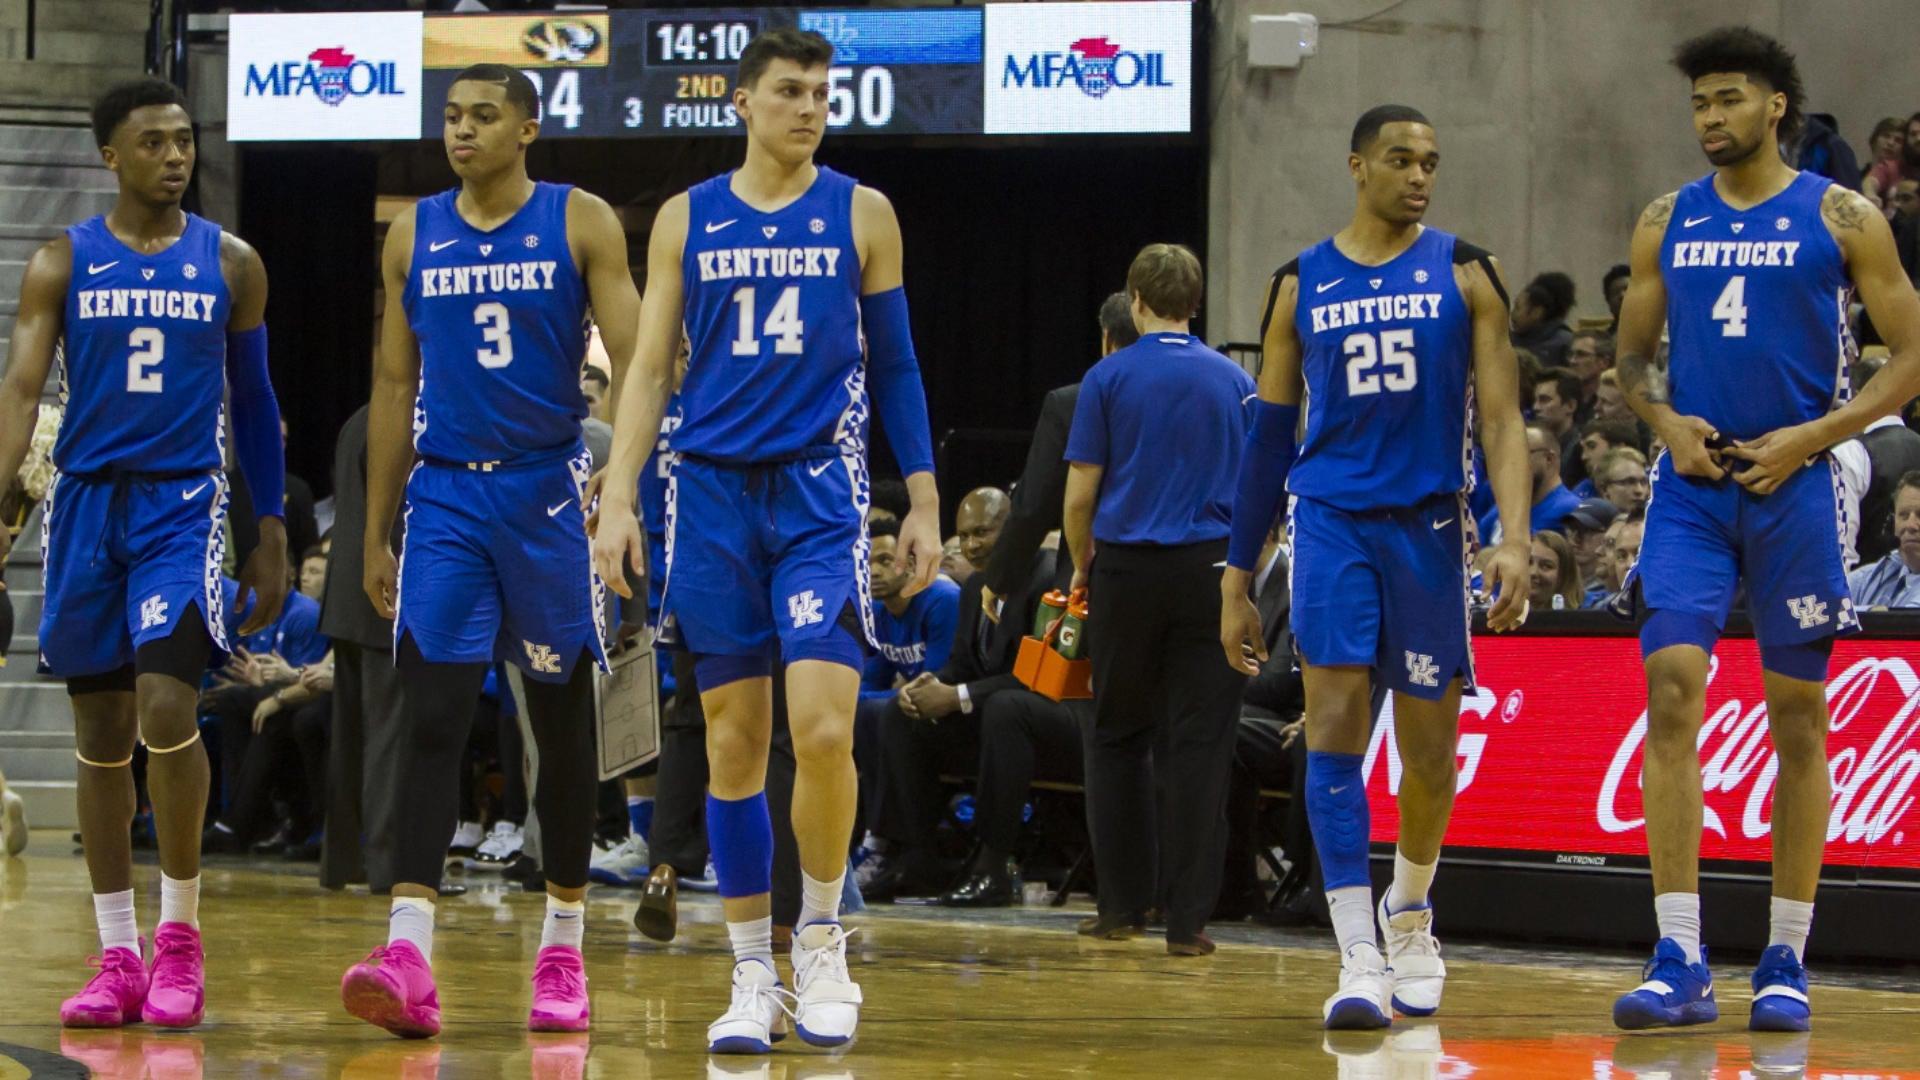 Reid Travis injury update: Kentucky big man expected to miss at least two weeks with knee sprain